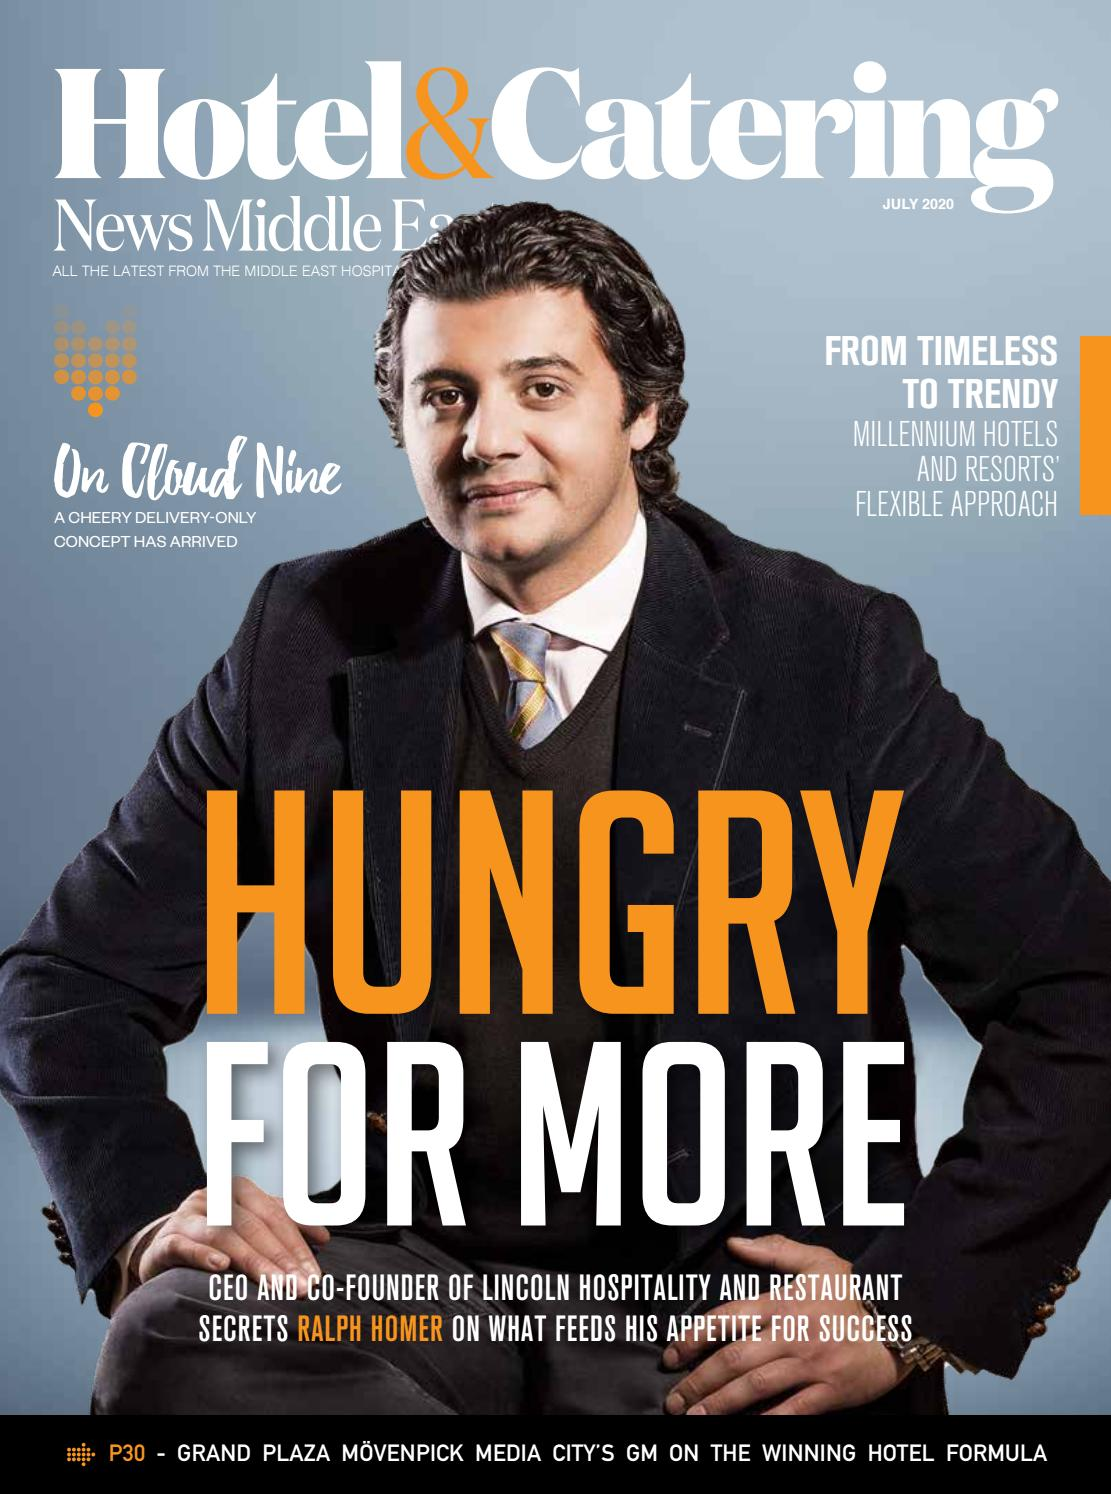 https://www.hotelnewsme.com/digital-magazine/hotel-catering-news-me-july-2020/